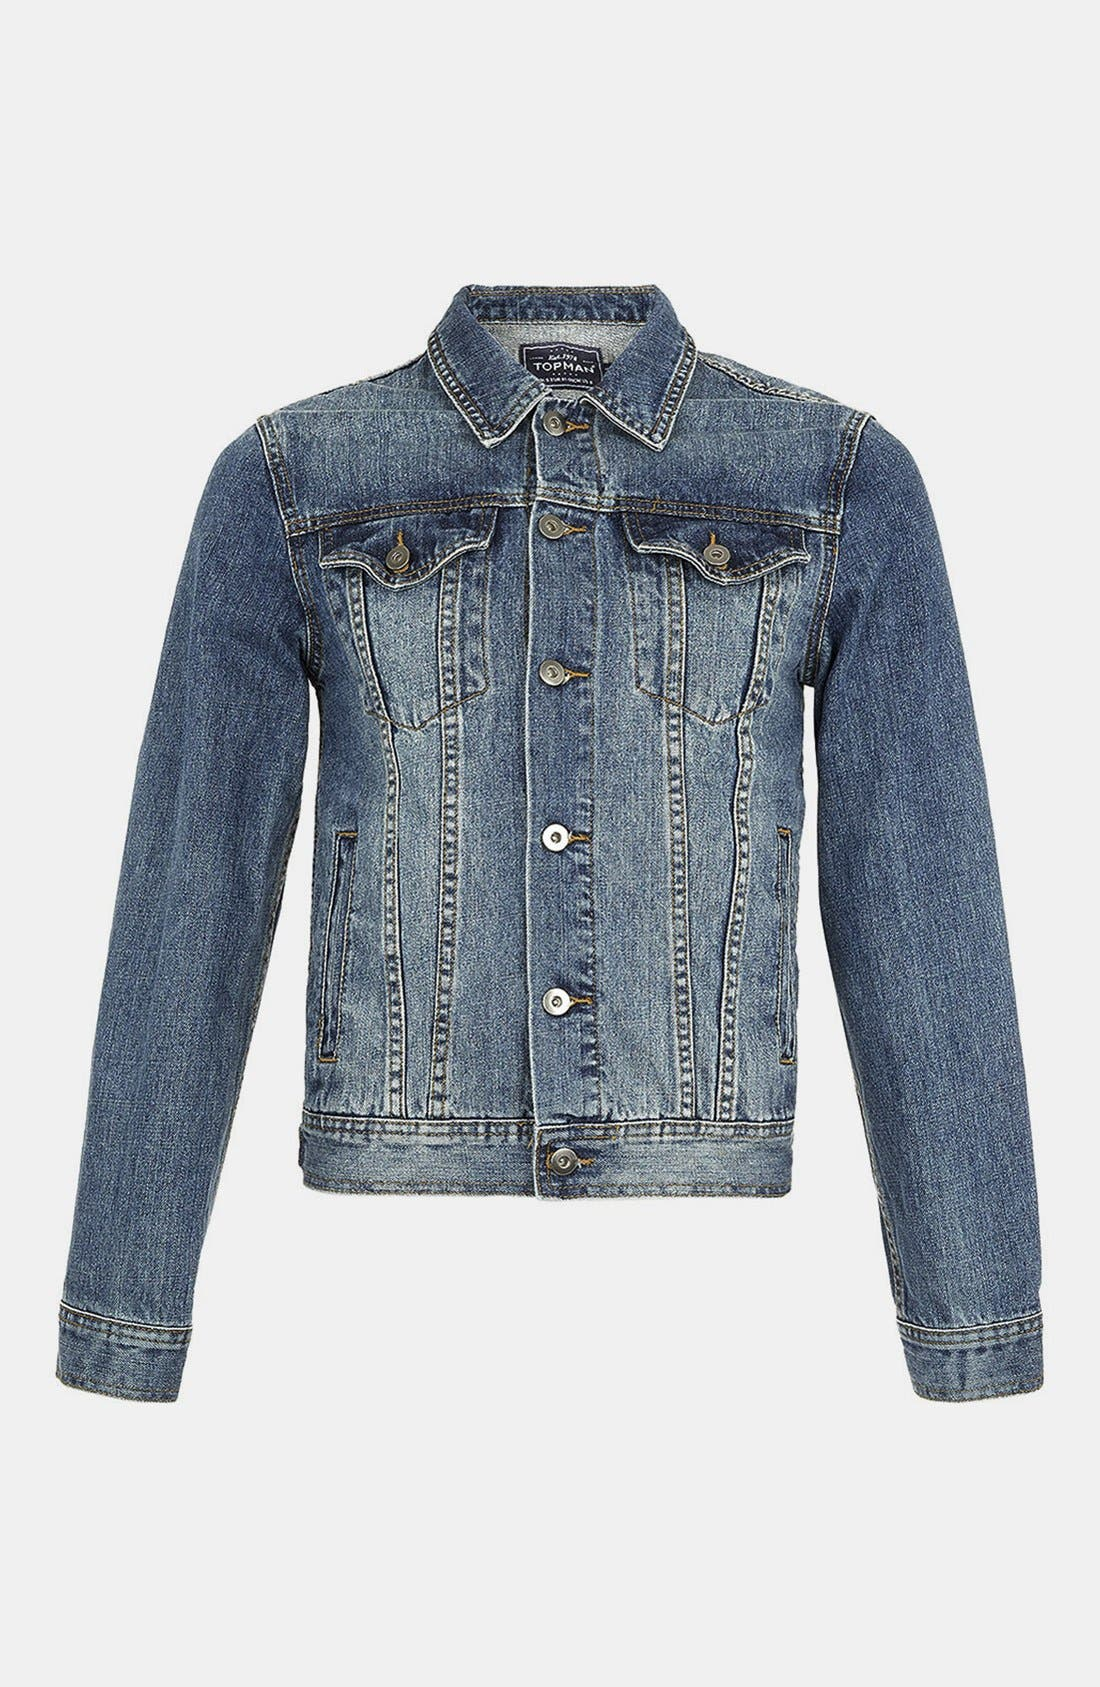 Alternate Image 1 Selected - Topman Denim Jacket